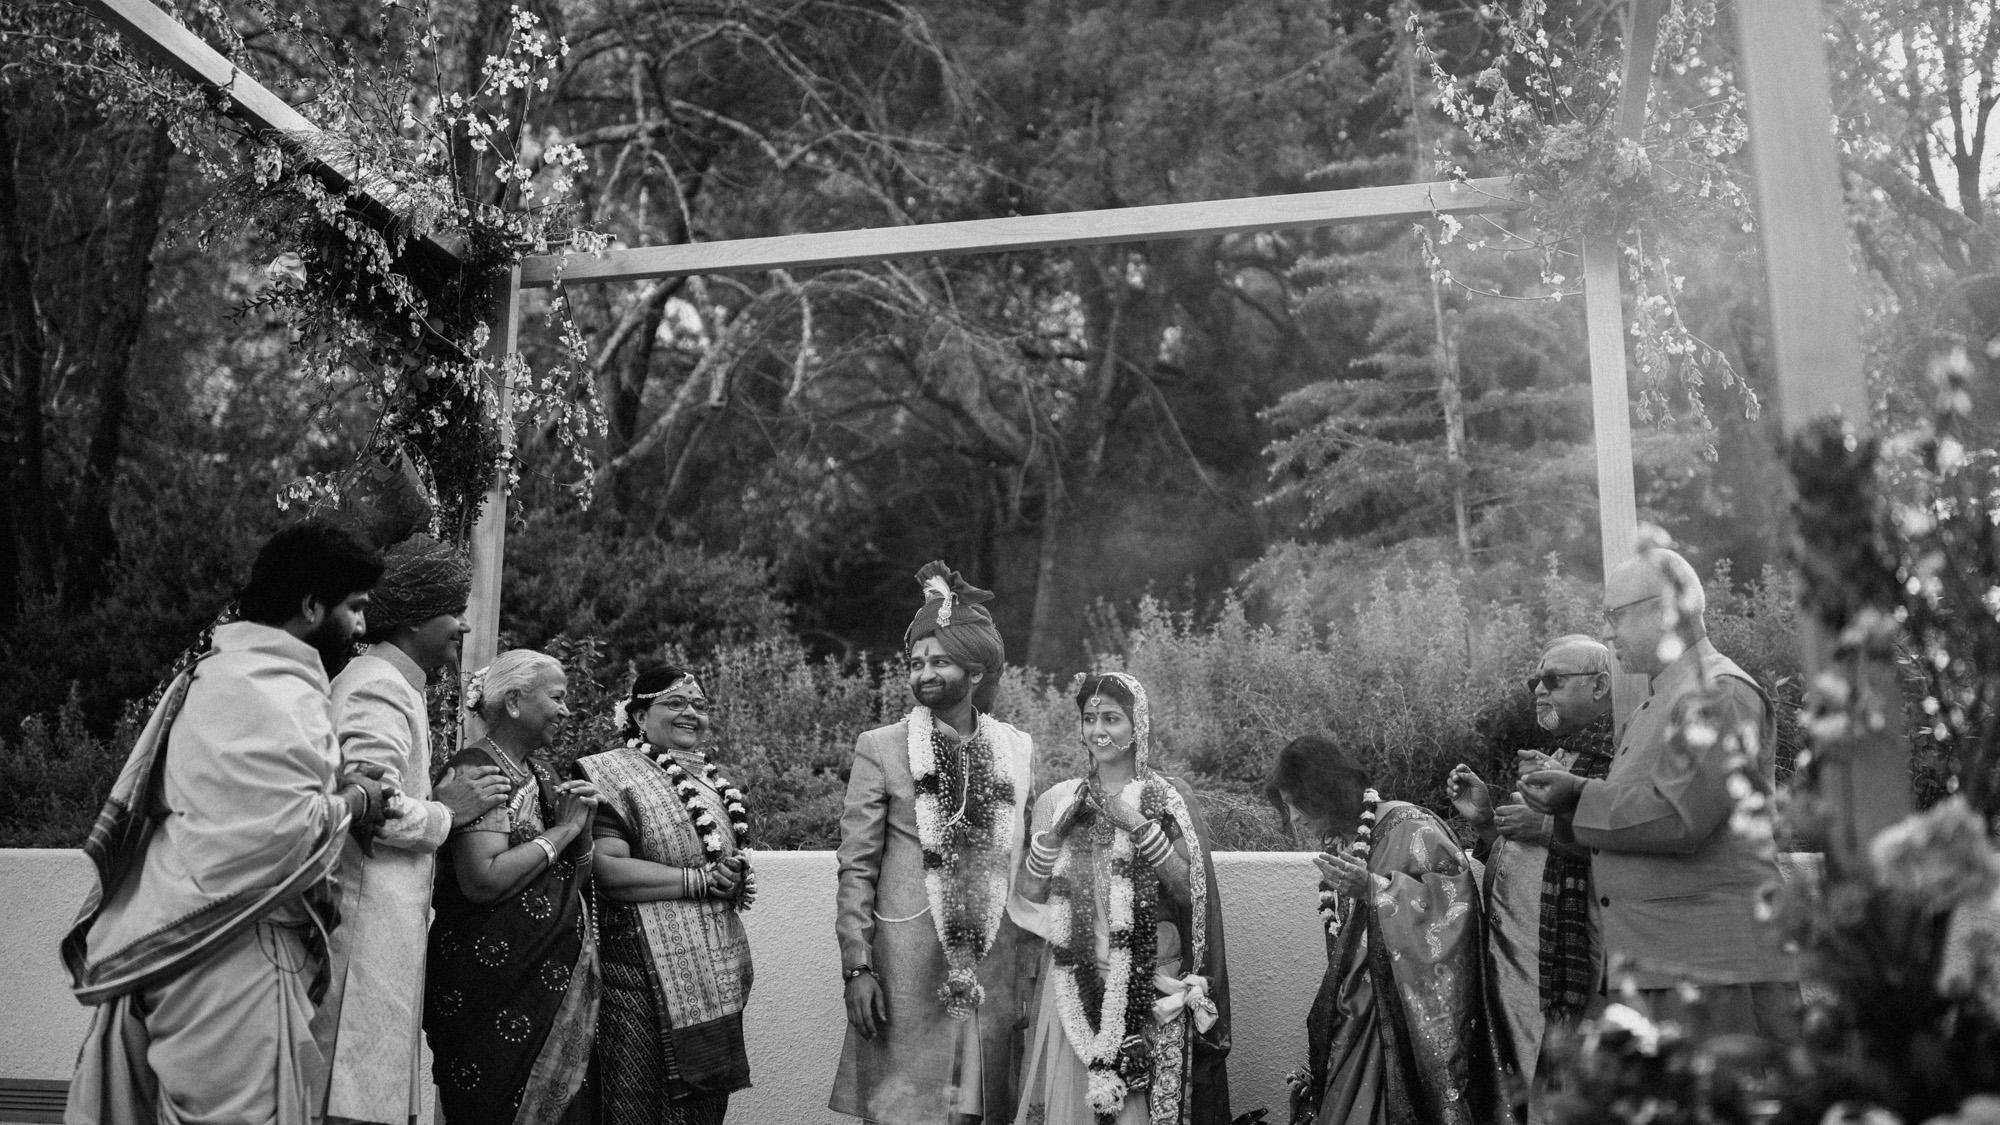 anu_maneesh_alec_vanderboom_Indian_wedding_photography-0113.jpg